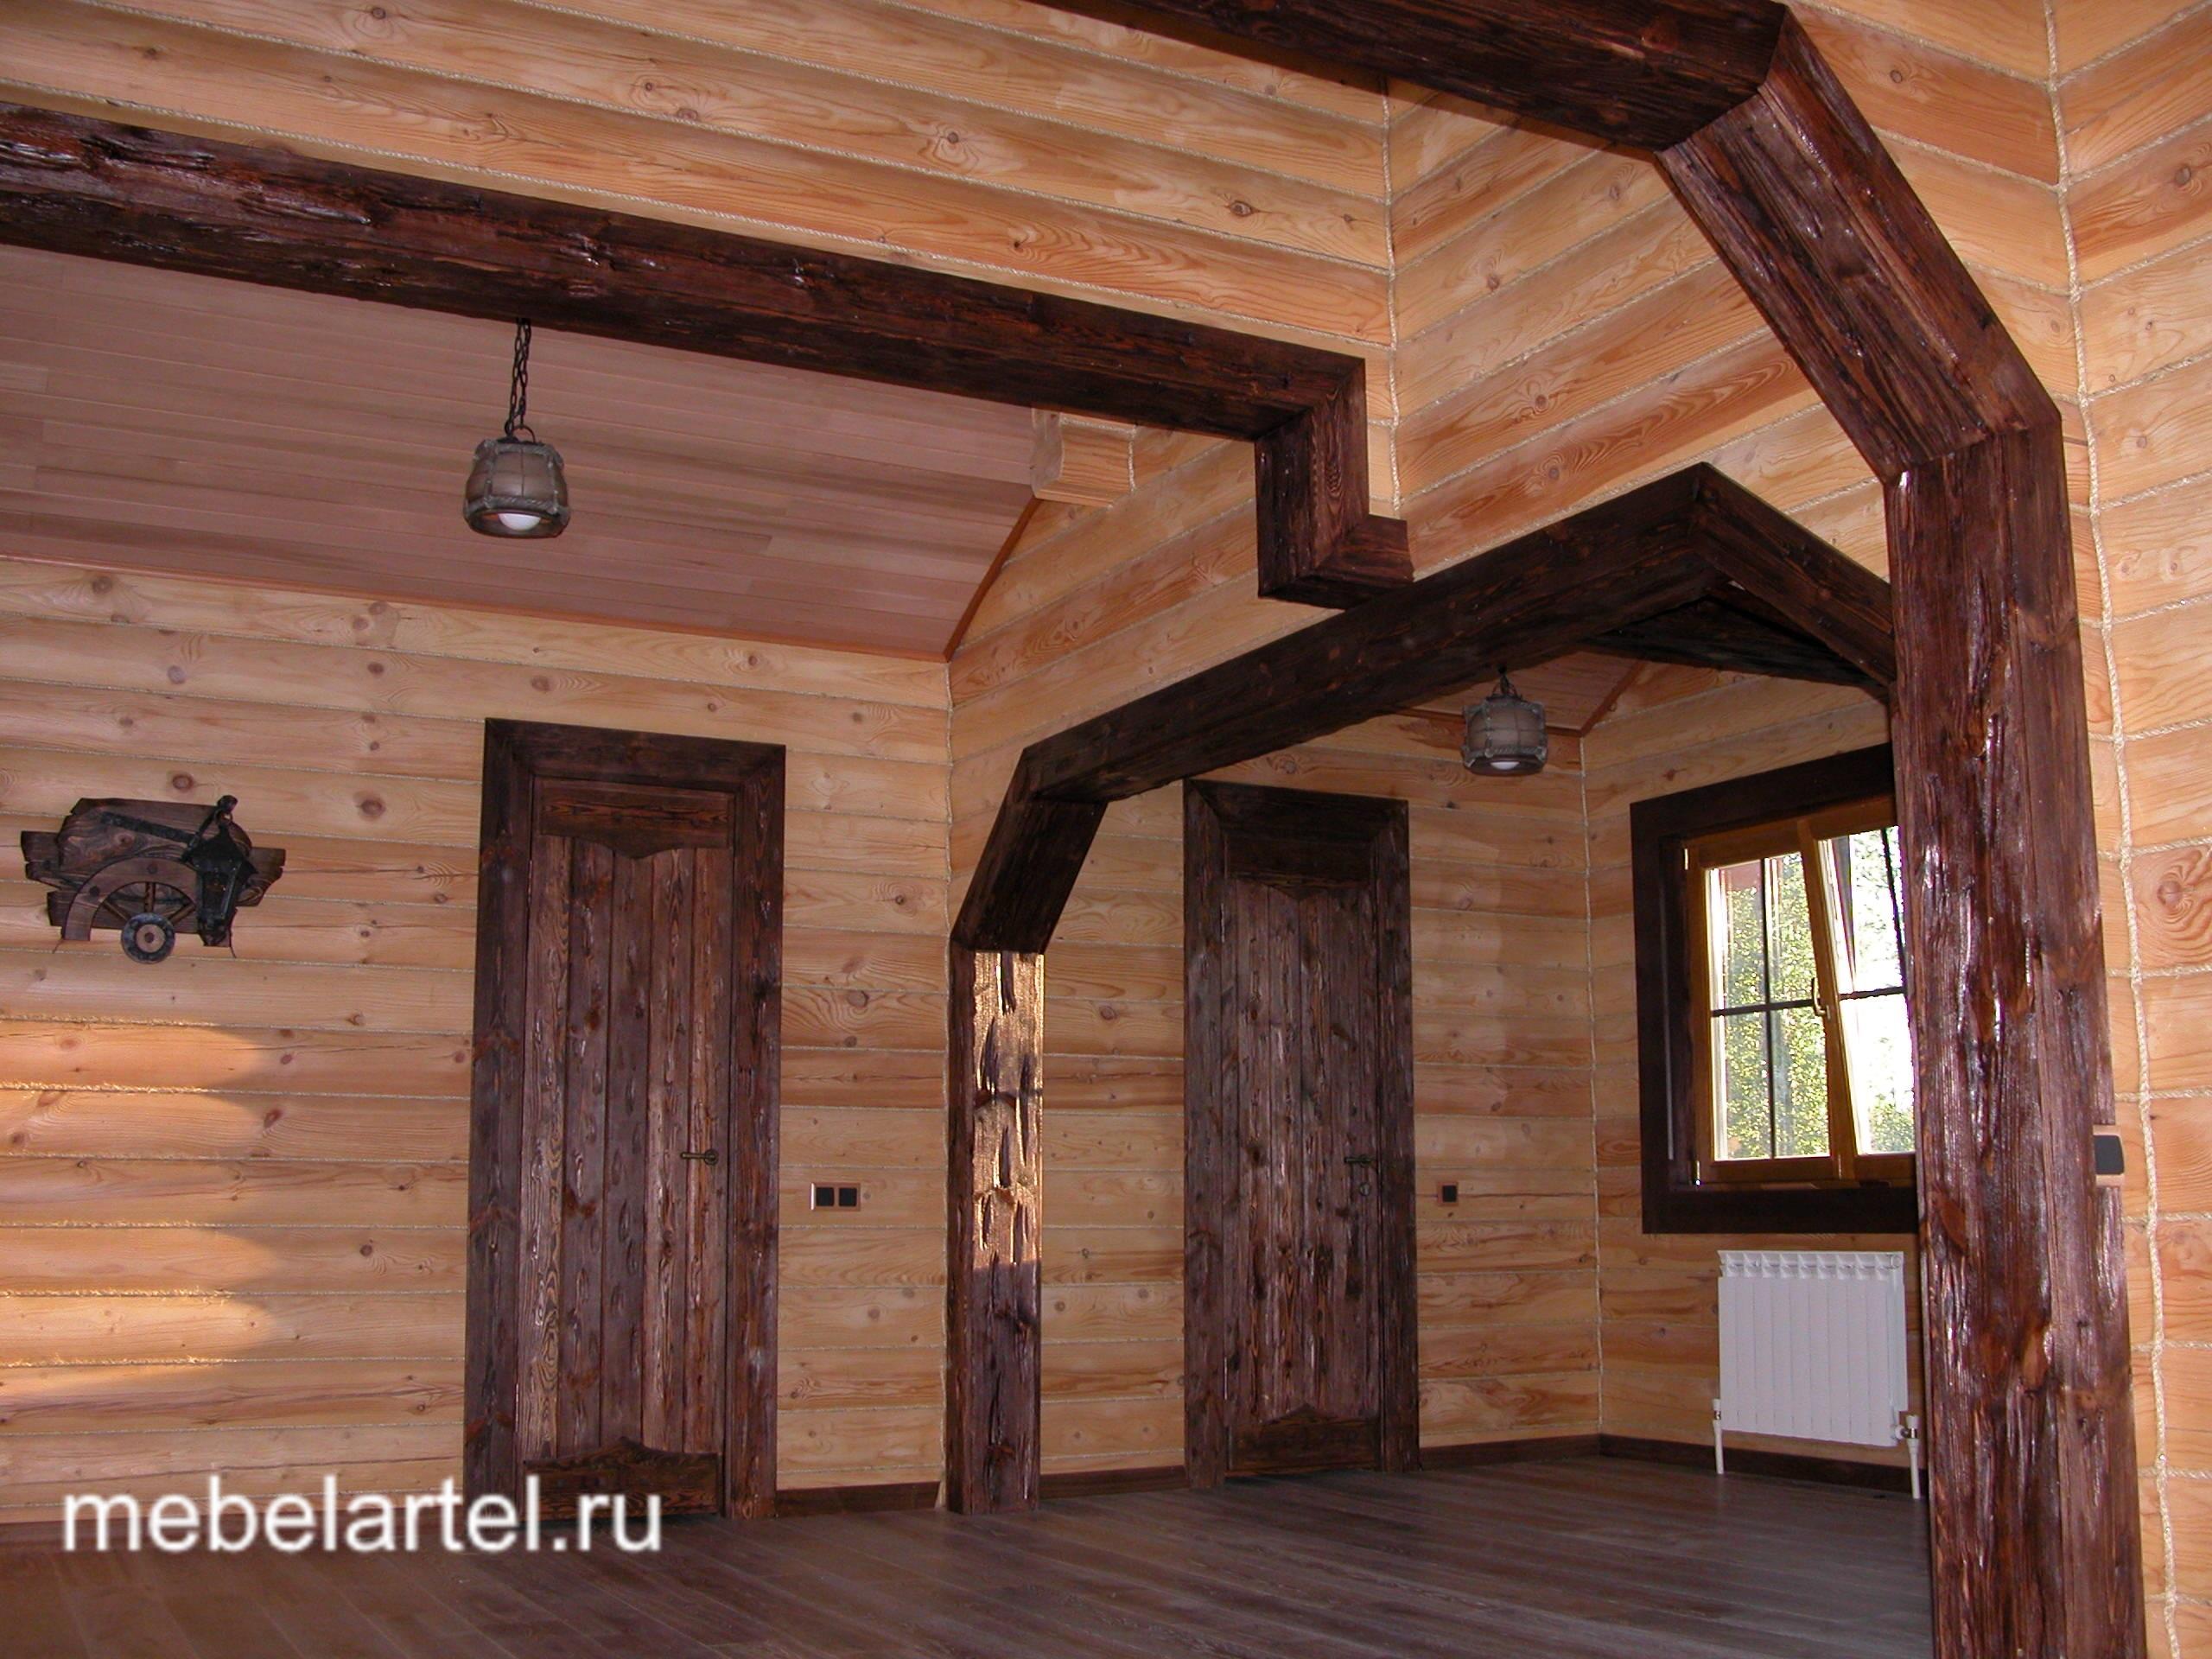 арка в деревянном доме из бруса фото системе